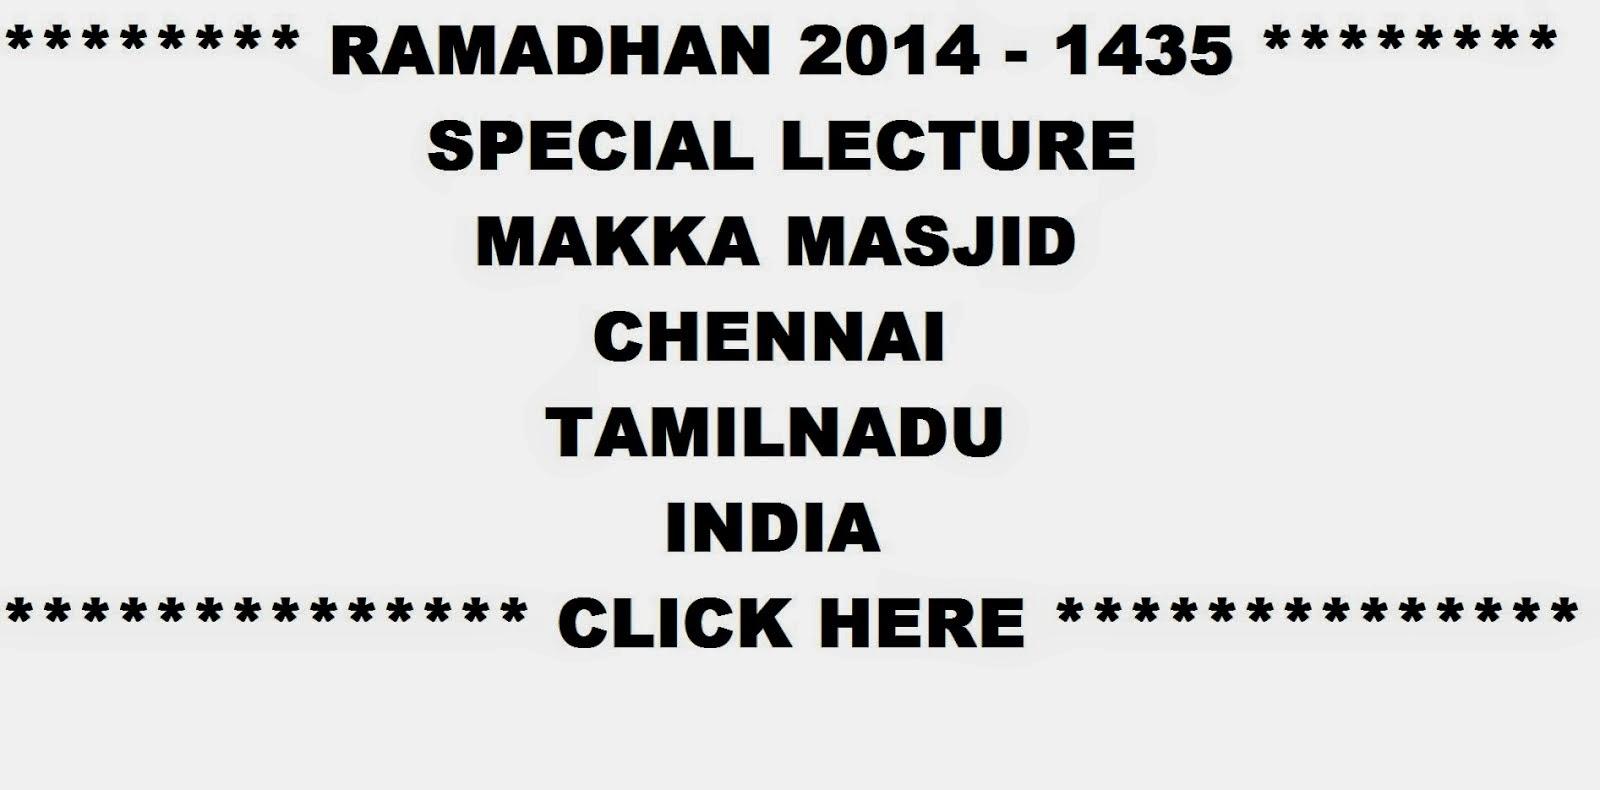 Ramadhan 2014/1435